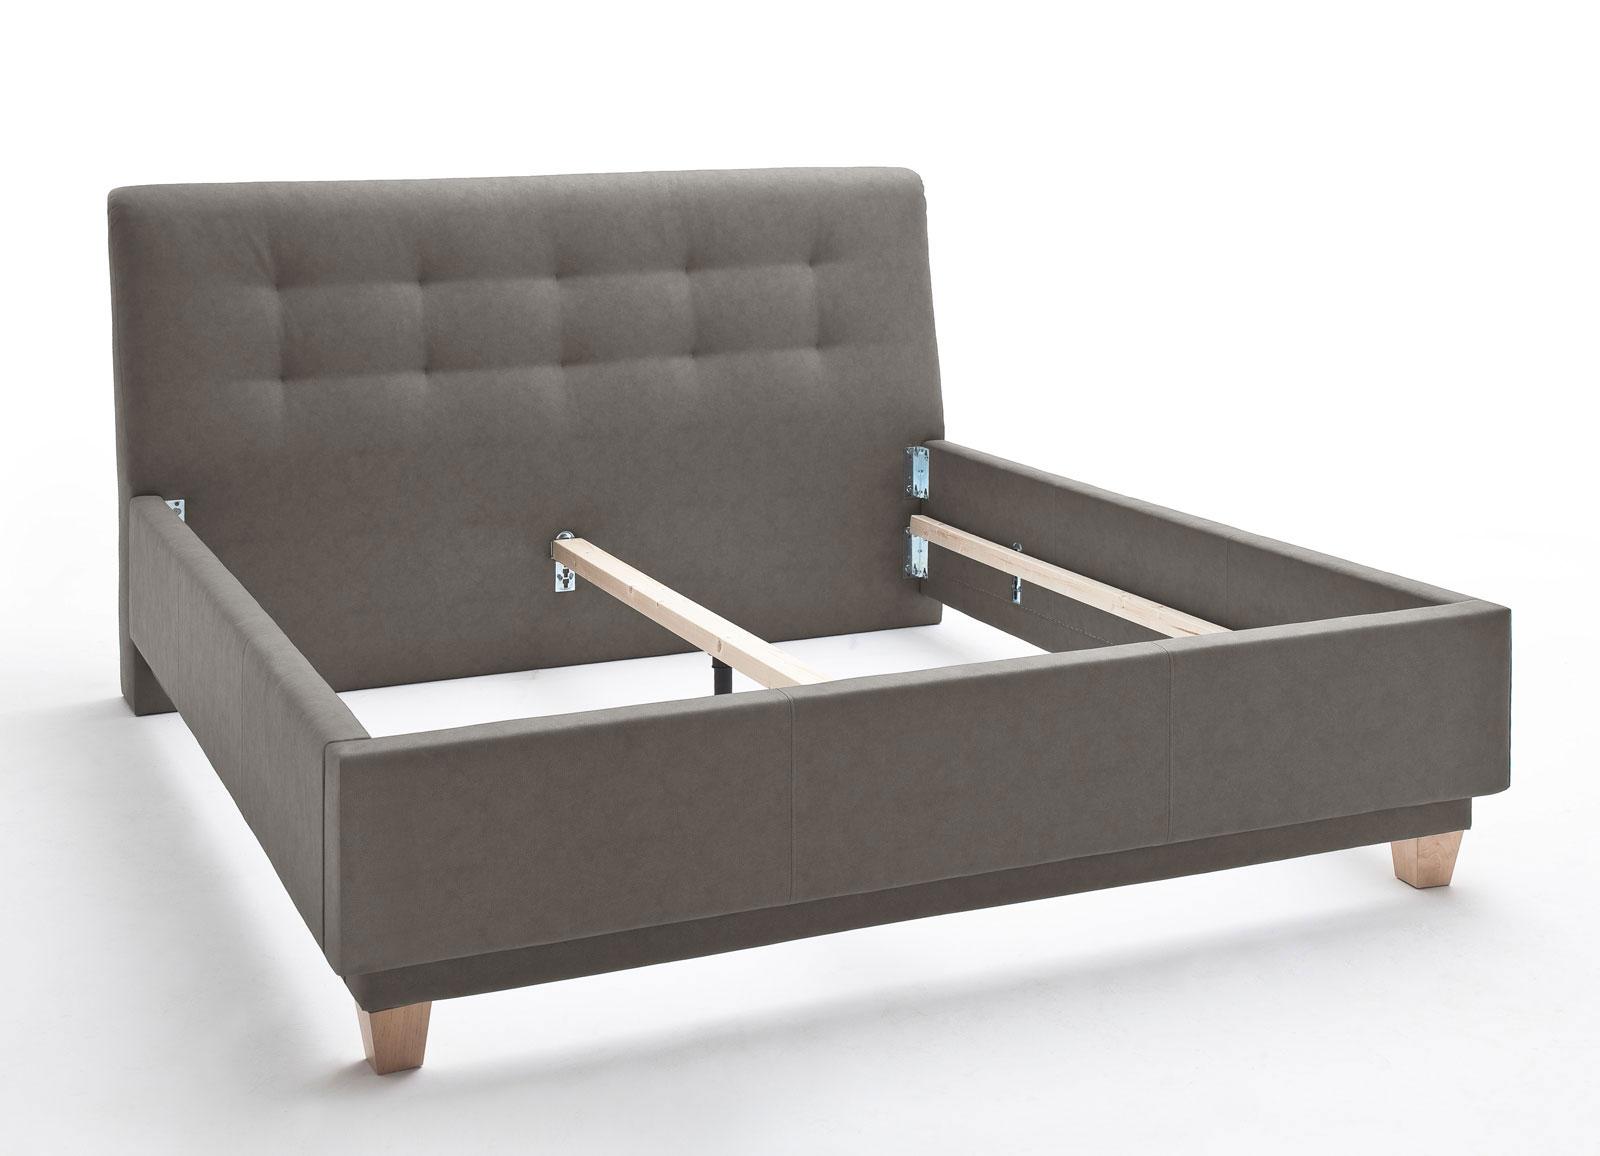 komforthöhe-polsterbett für jumbo-matratzen - saida   betten.de, Hause deko